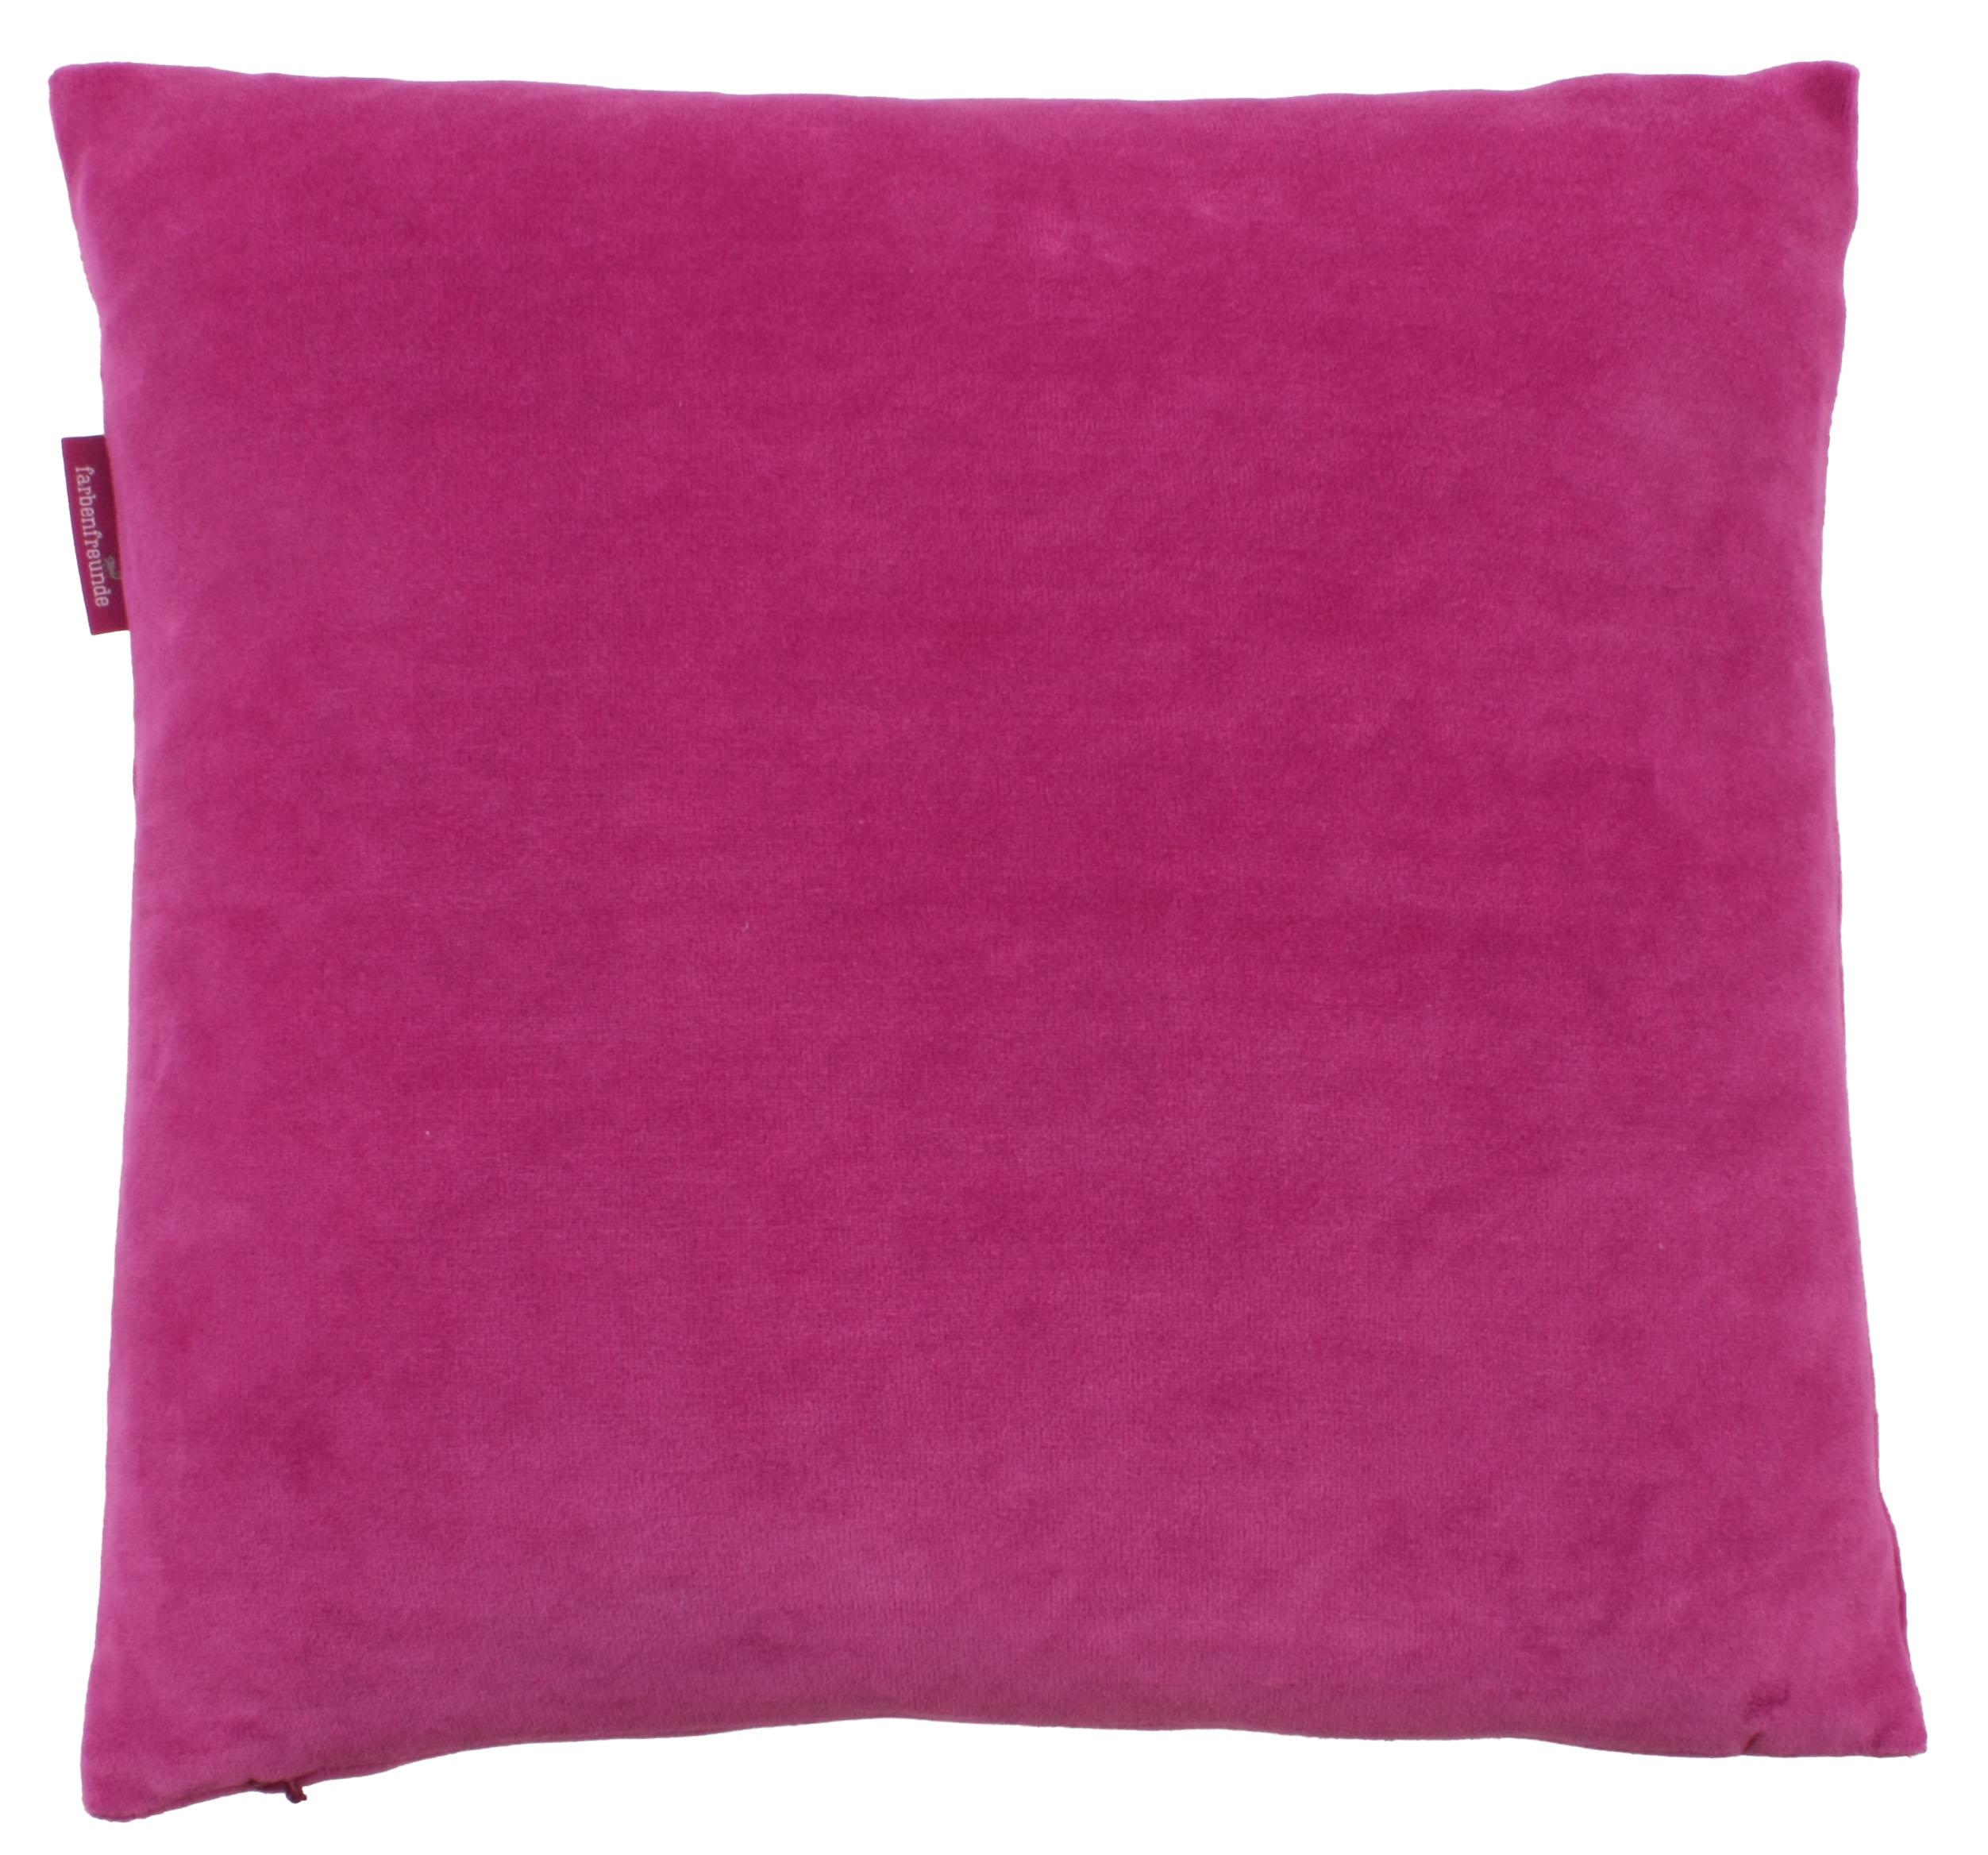 kissenh lle farbenfreunde 40x40 cm fuchsia der bettenhaus online shop. Black Bedroom Furniture Sets. Home Design Ideas